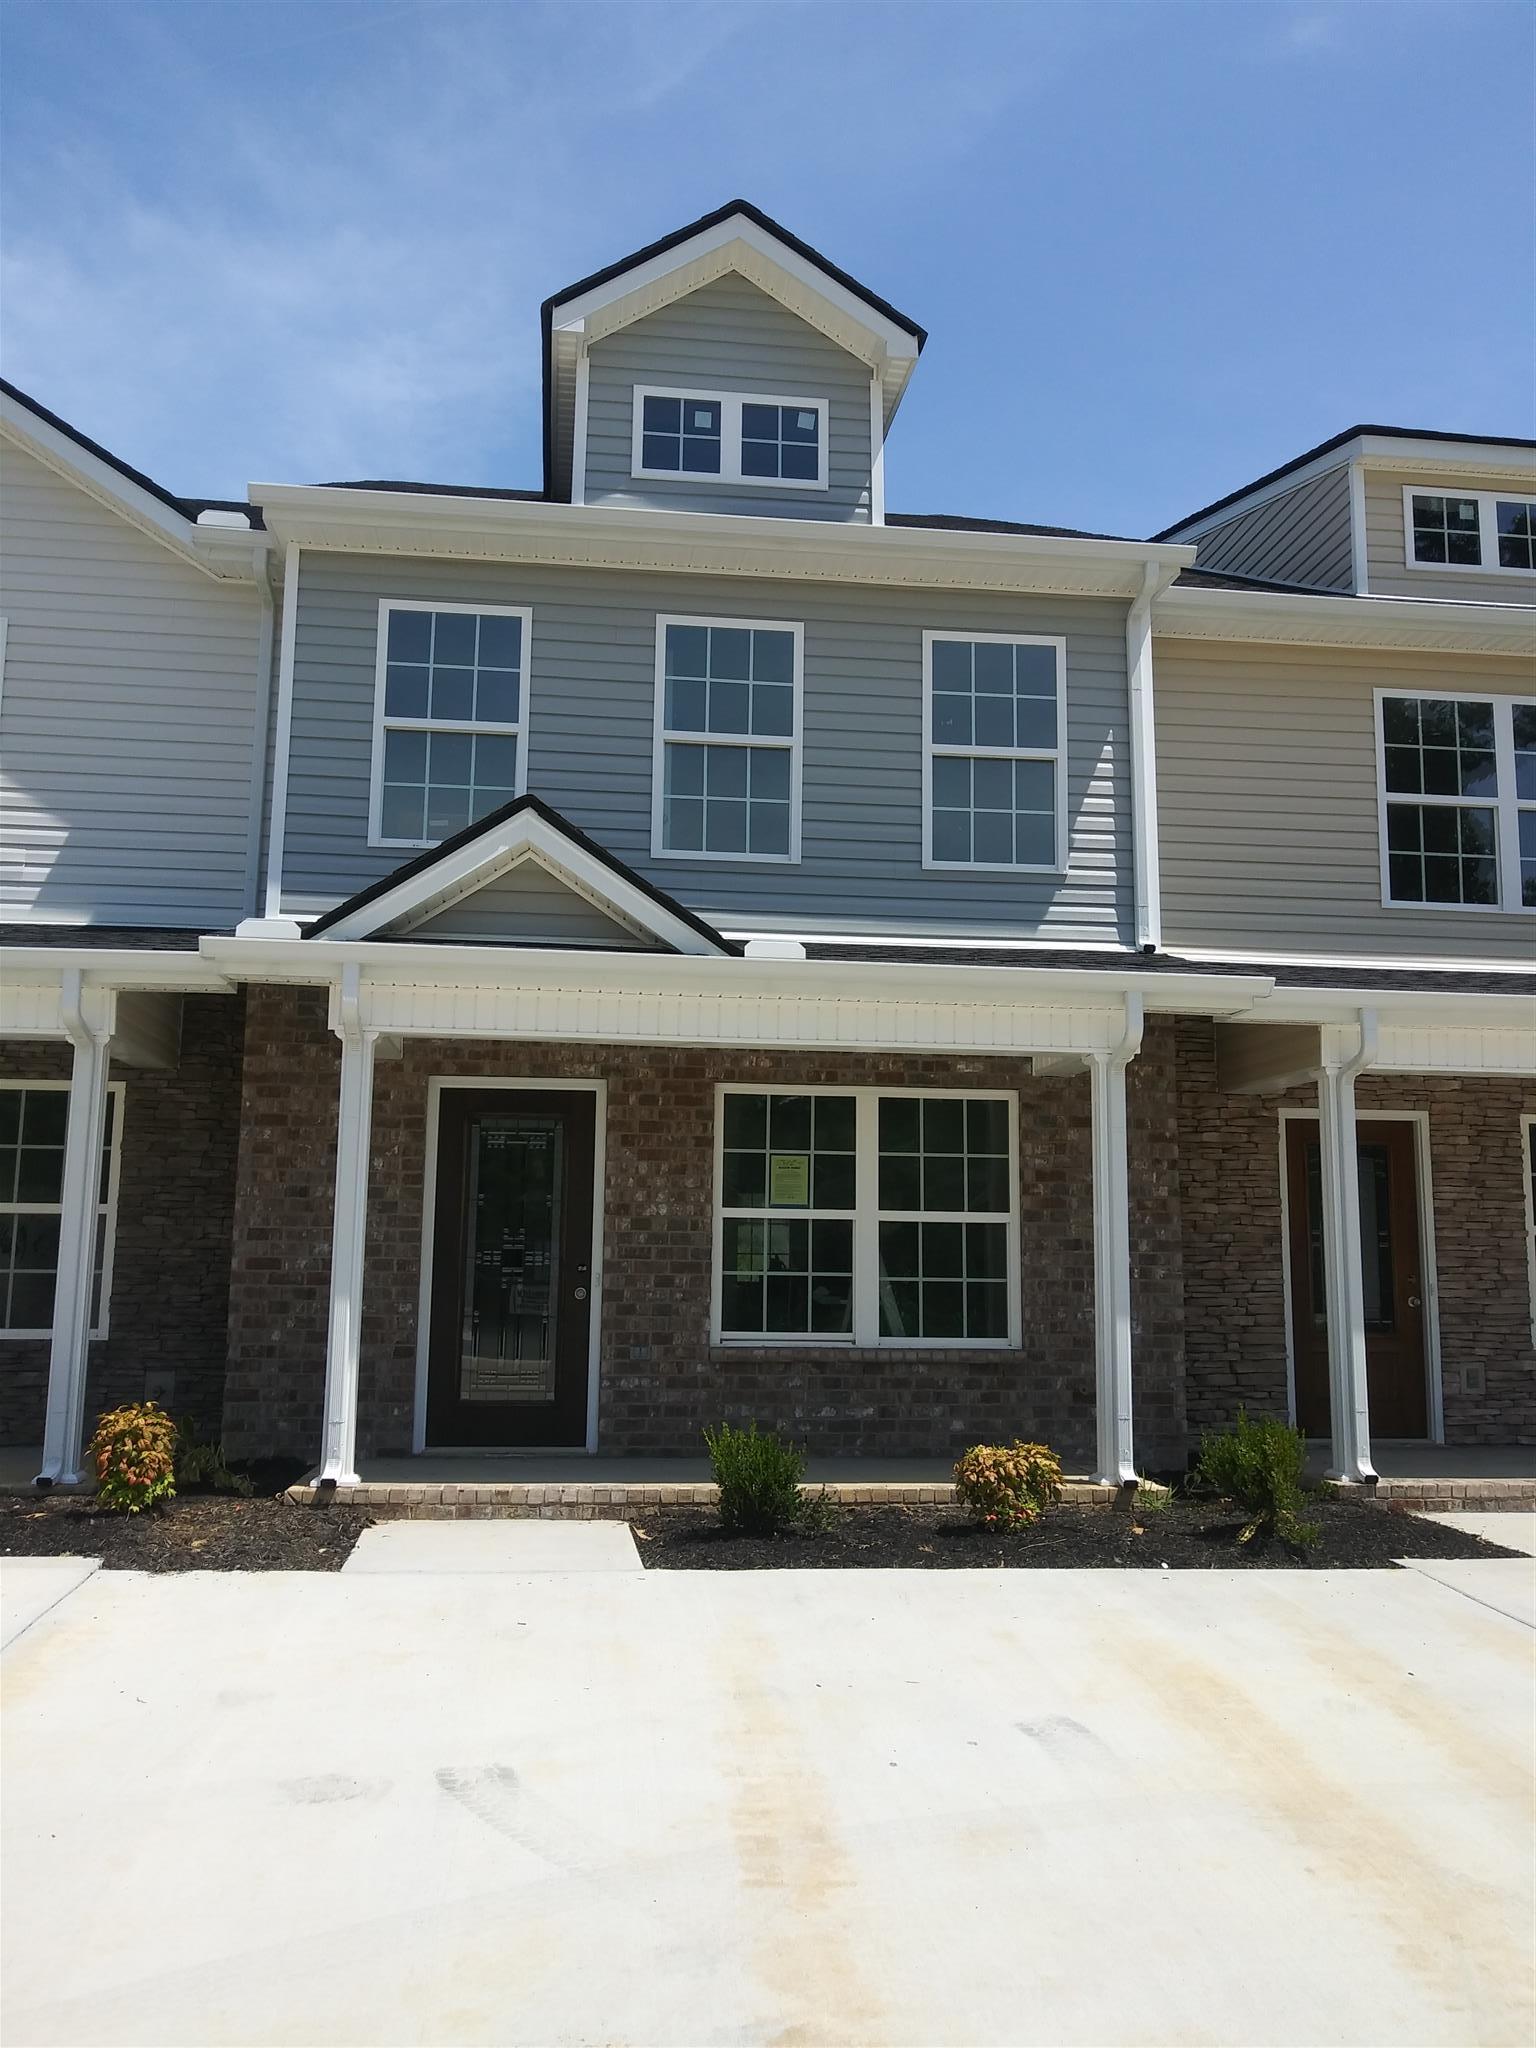 19 lot 19 Downstream, Ashland City, TN 37015 - Ashland City, TN real estate listing